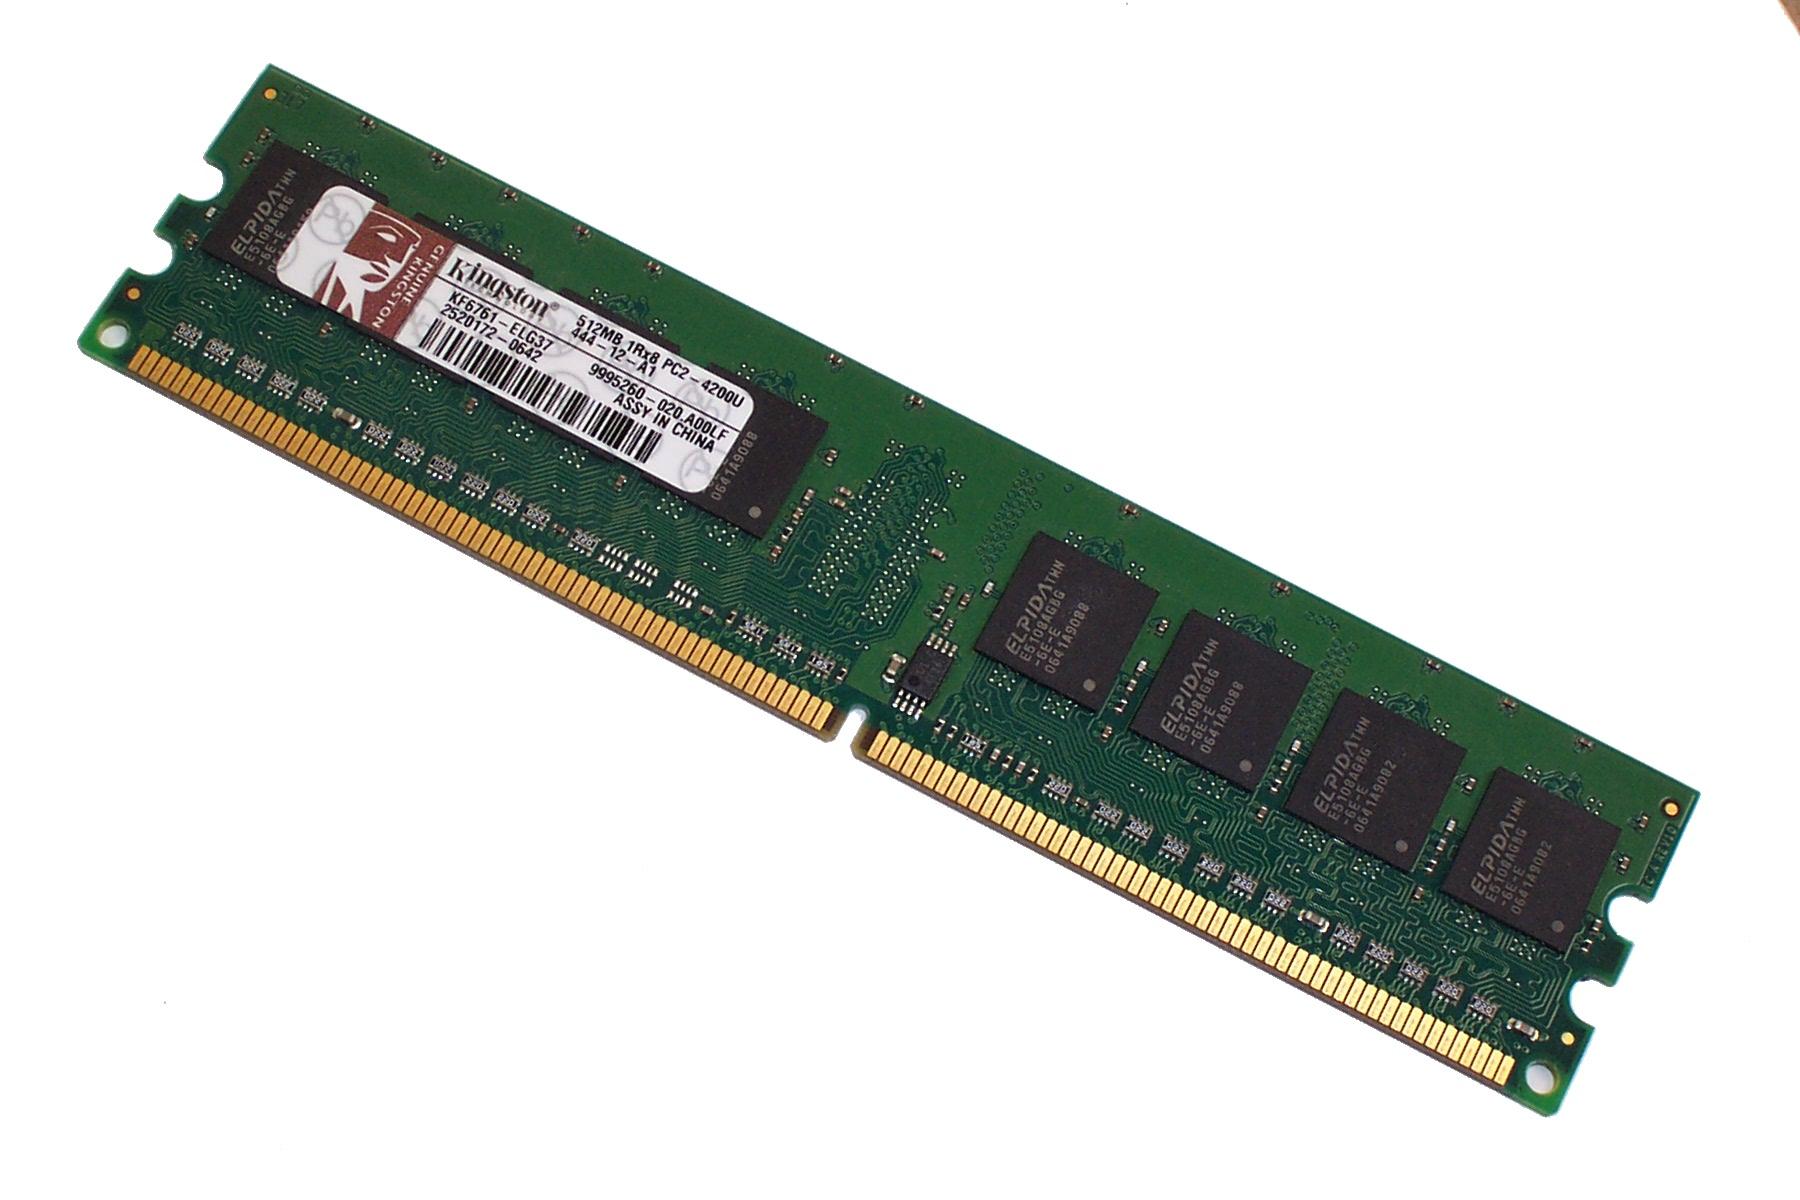 Kingston KF6761-ELG37 512MB PC2-4200U 533MHz CL4 DDR2